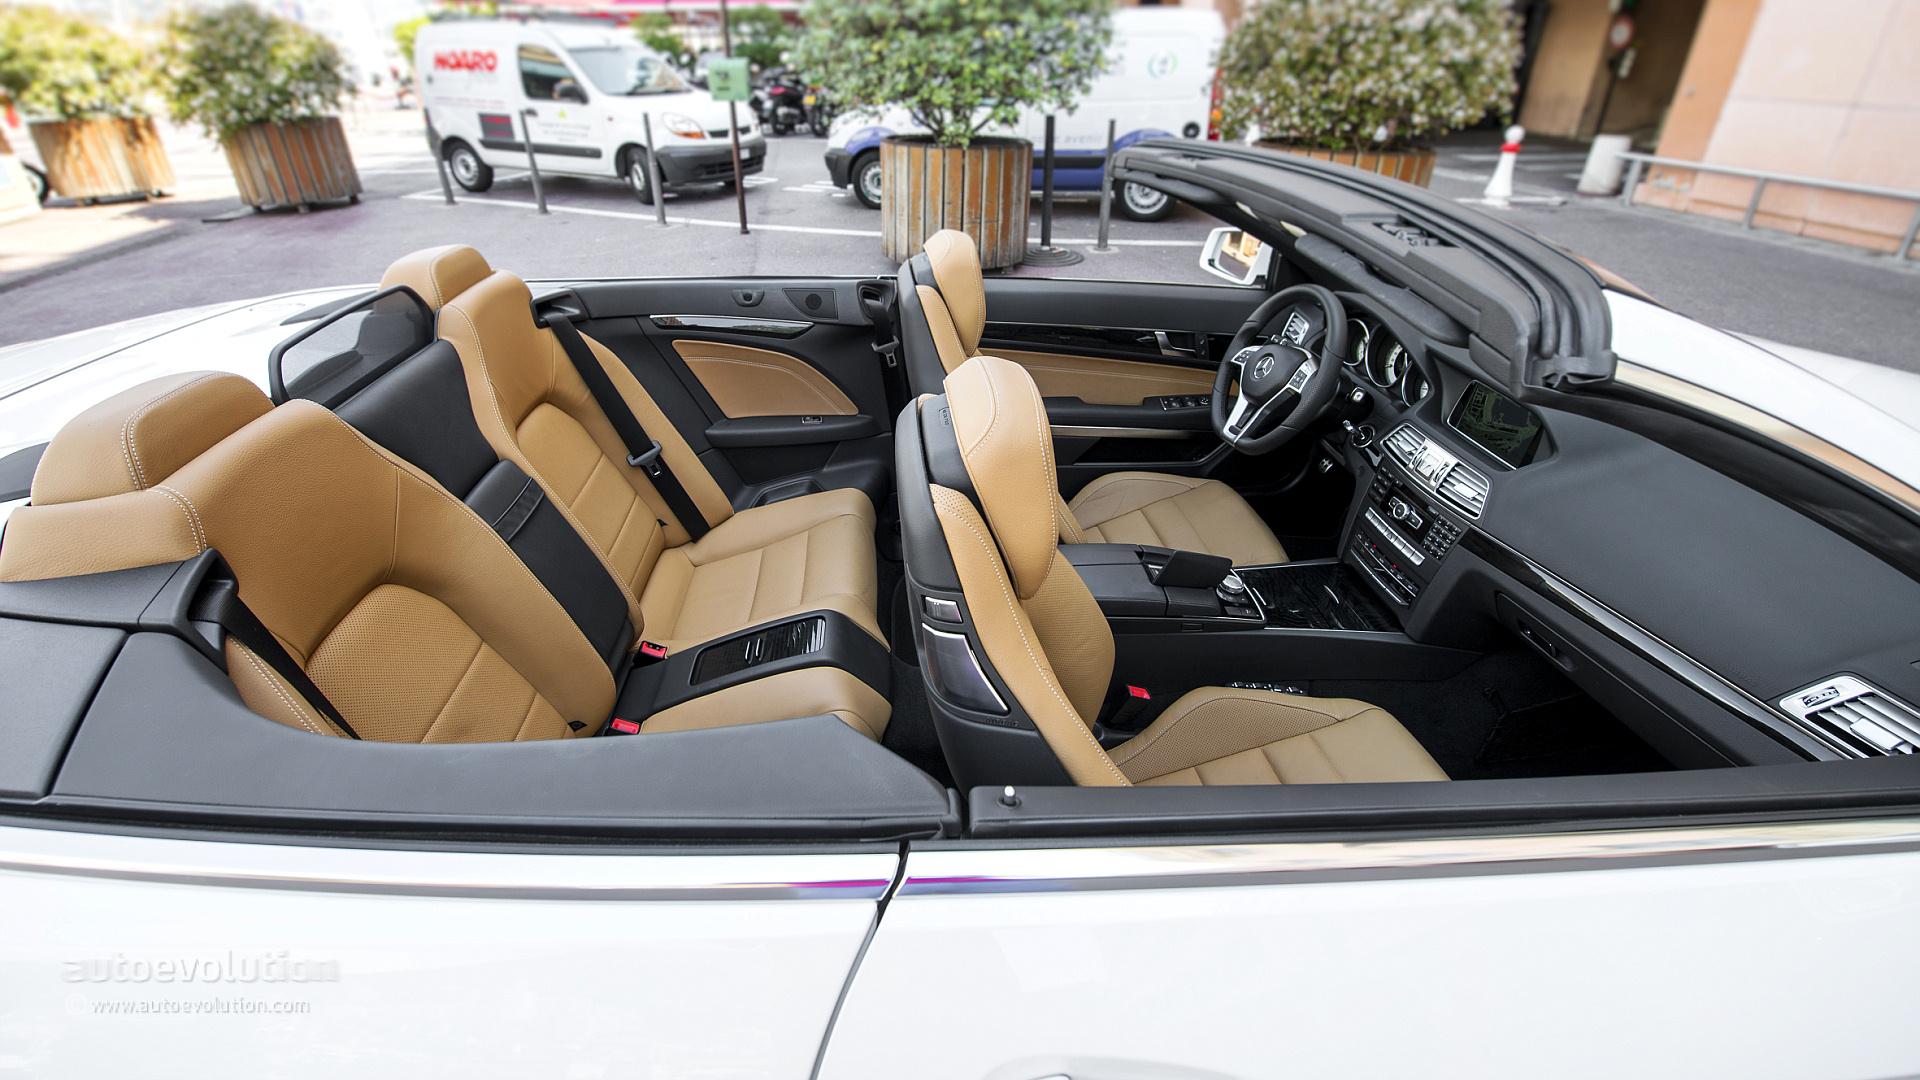 mercedes benz e 250 cgi cabriolet tested by autoevolution. Black Bedroom Furniture Sets. Home Design Ideas